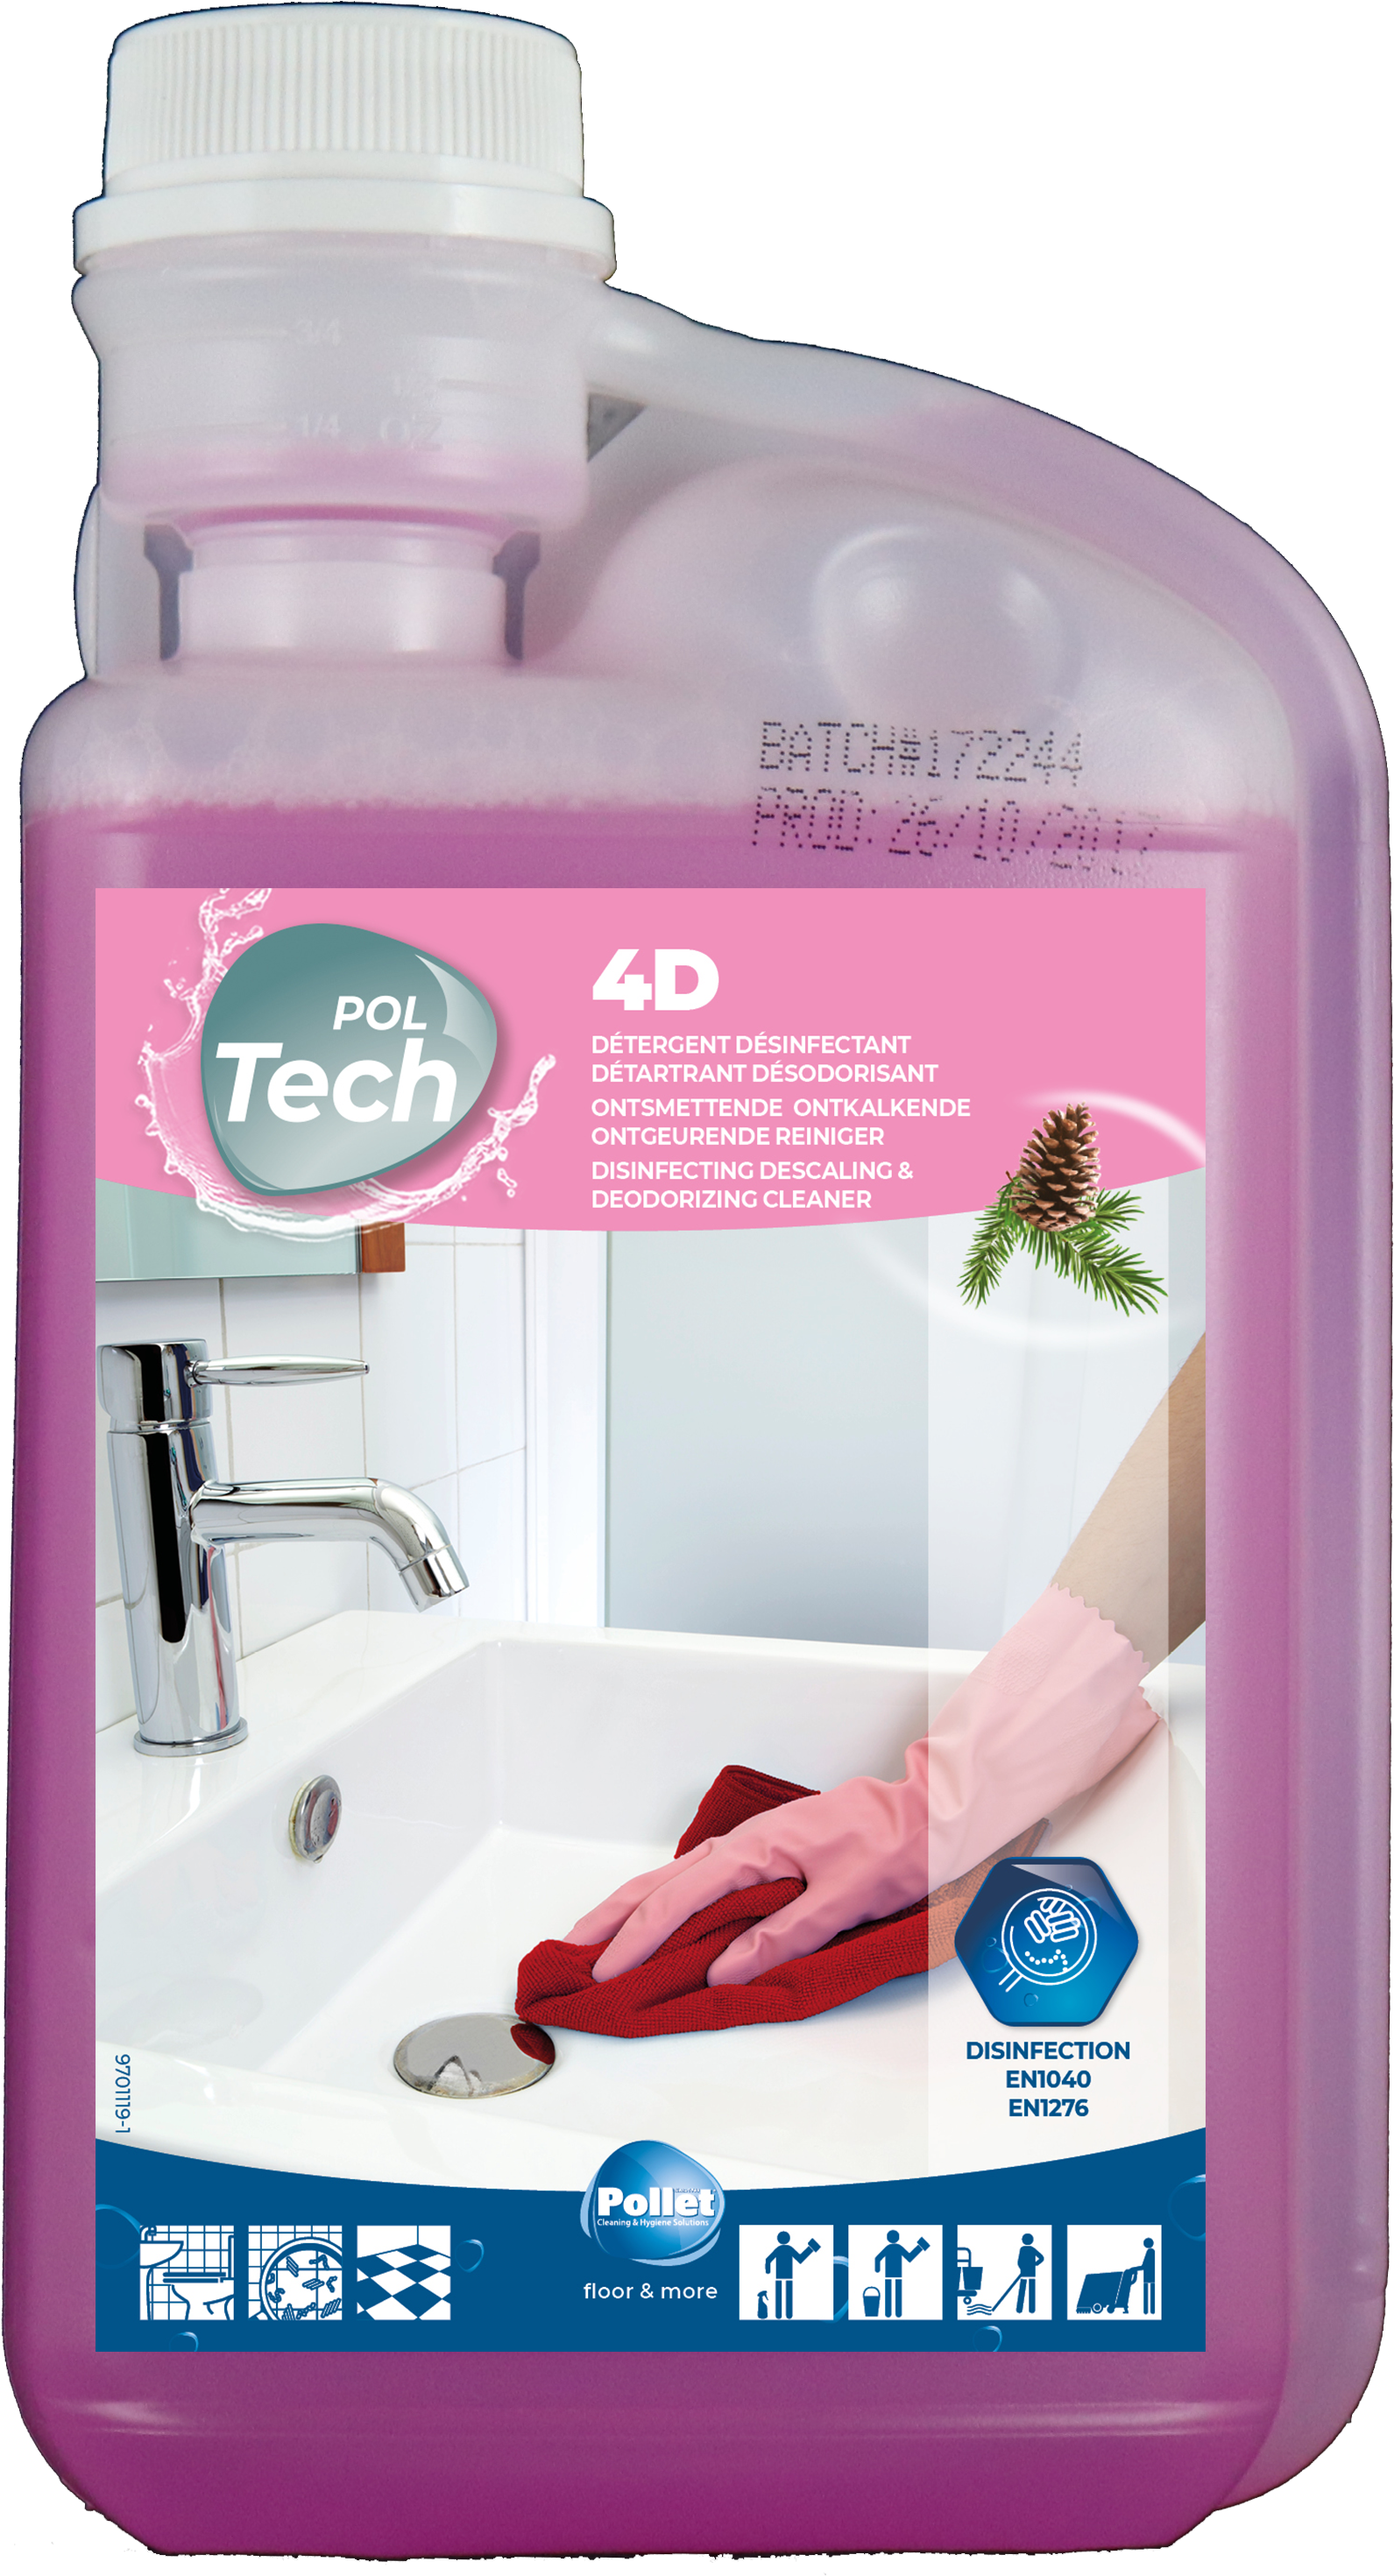 POLTECH 4D krachtige ontkalkende deterg.